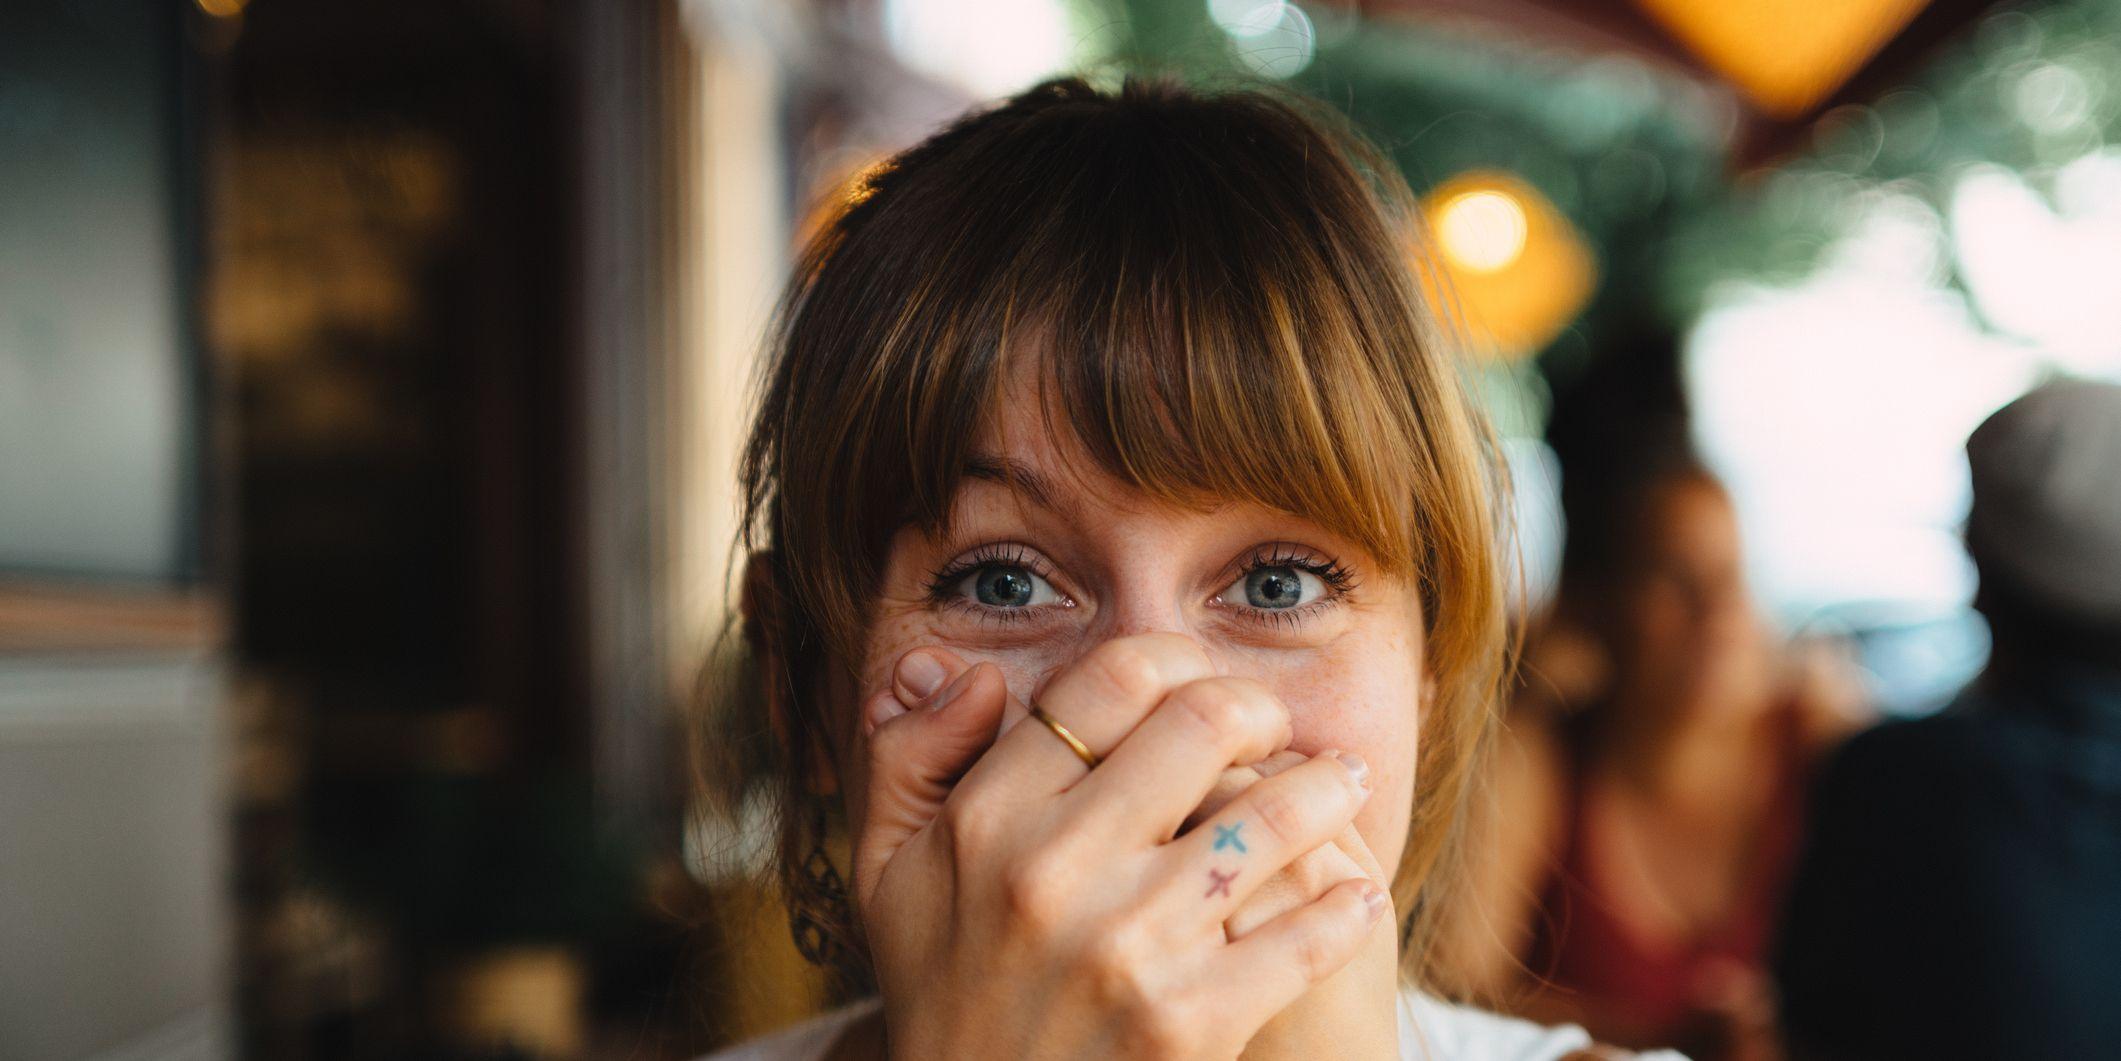 No7 mascara sells one ever nine seconds - Women's Health UK